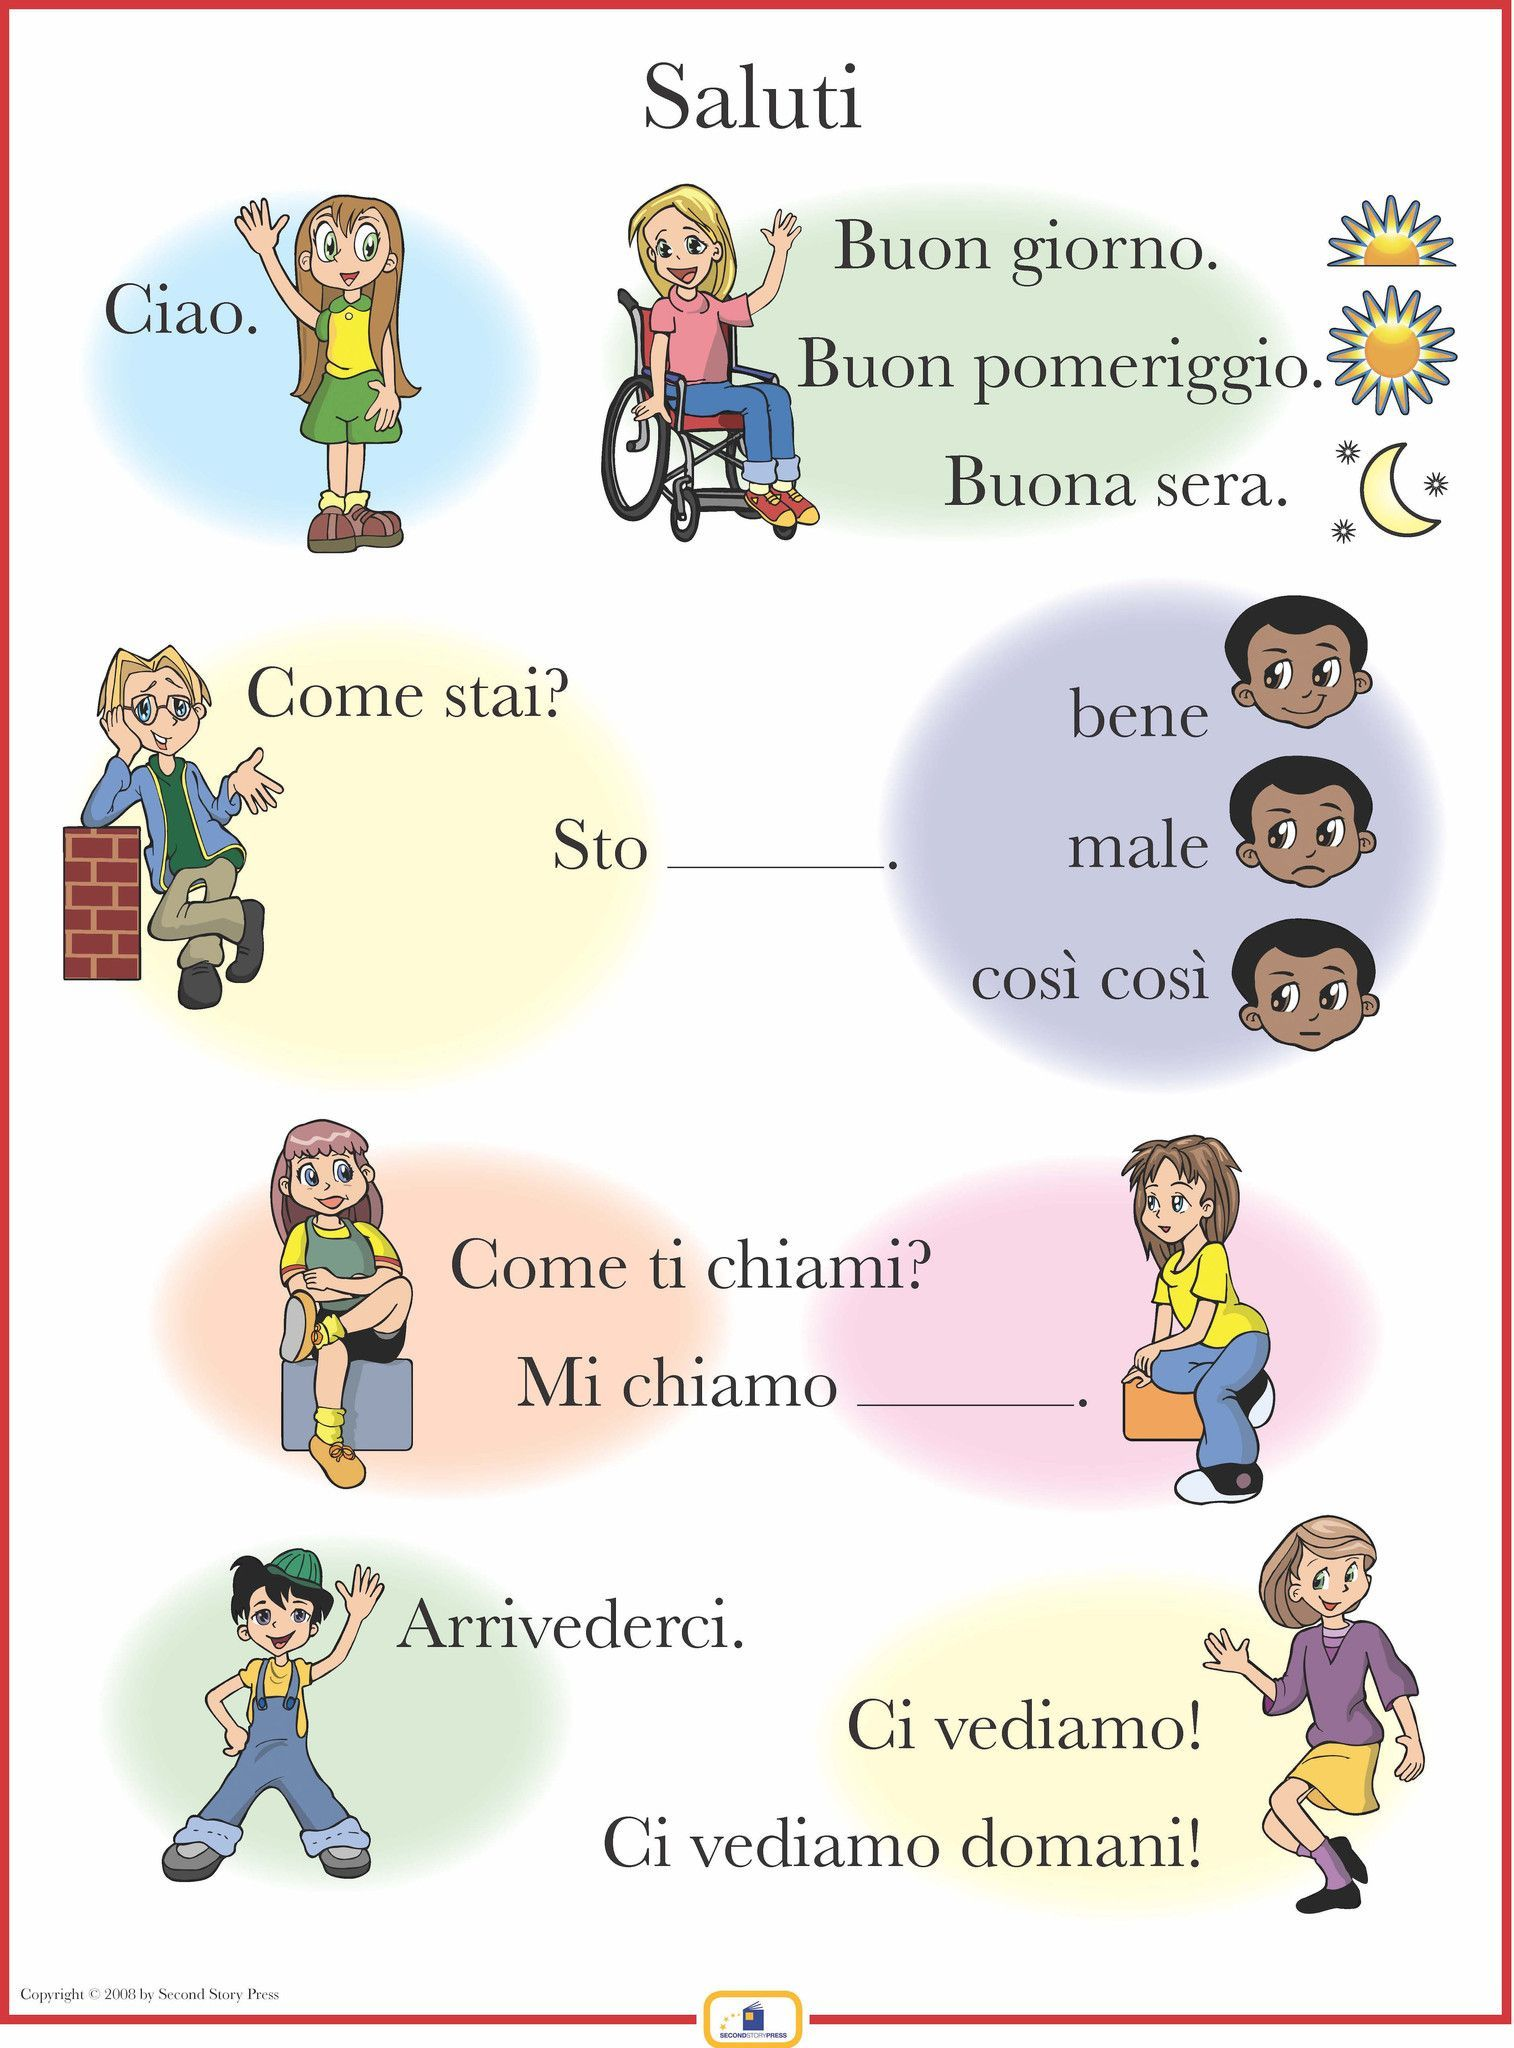 Italian Sign Language Love